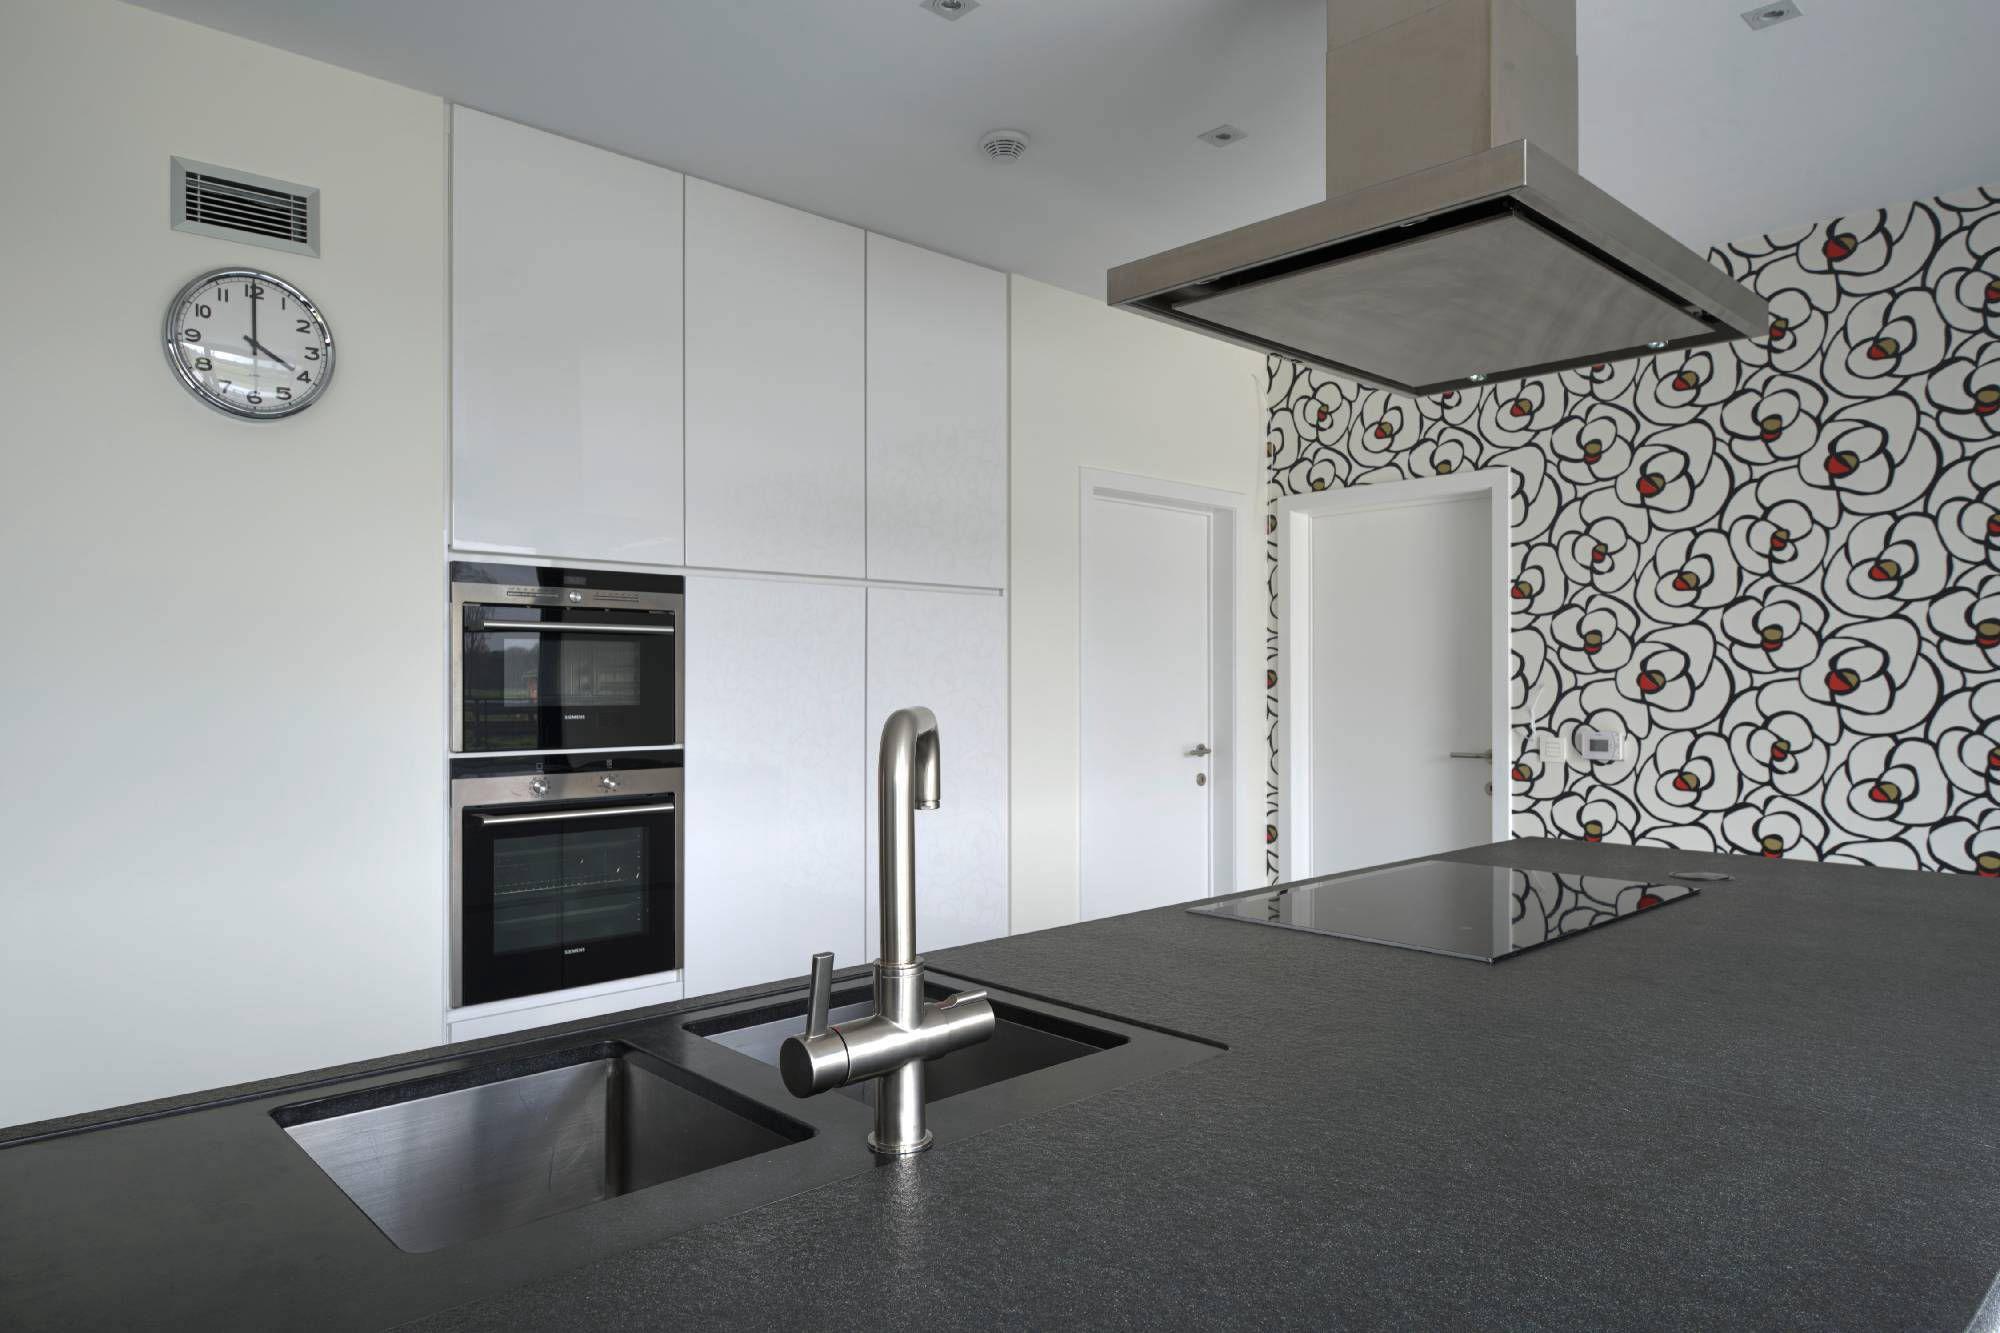 Nieuwe Keuken Op Maat.Van Oerle Interieur Keukens Keuken Nieuwe Keuken Keuken